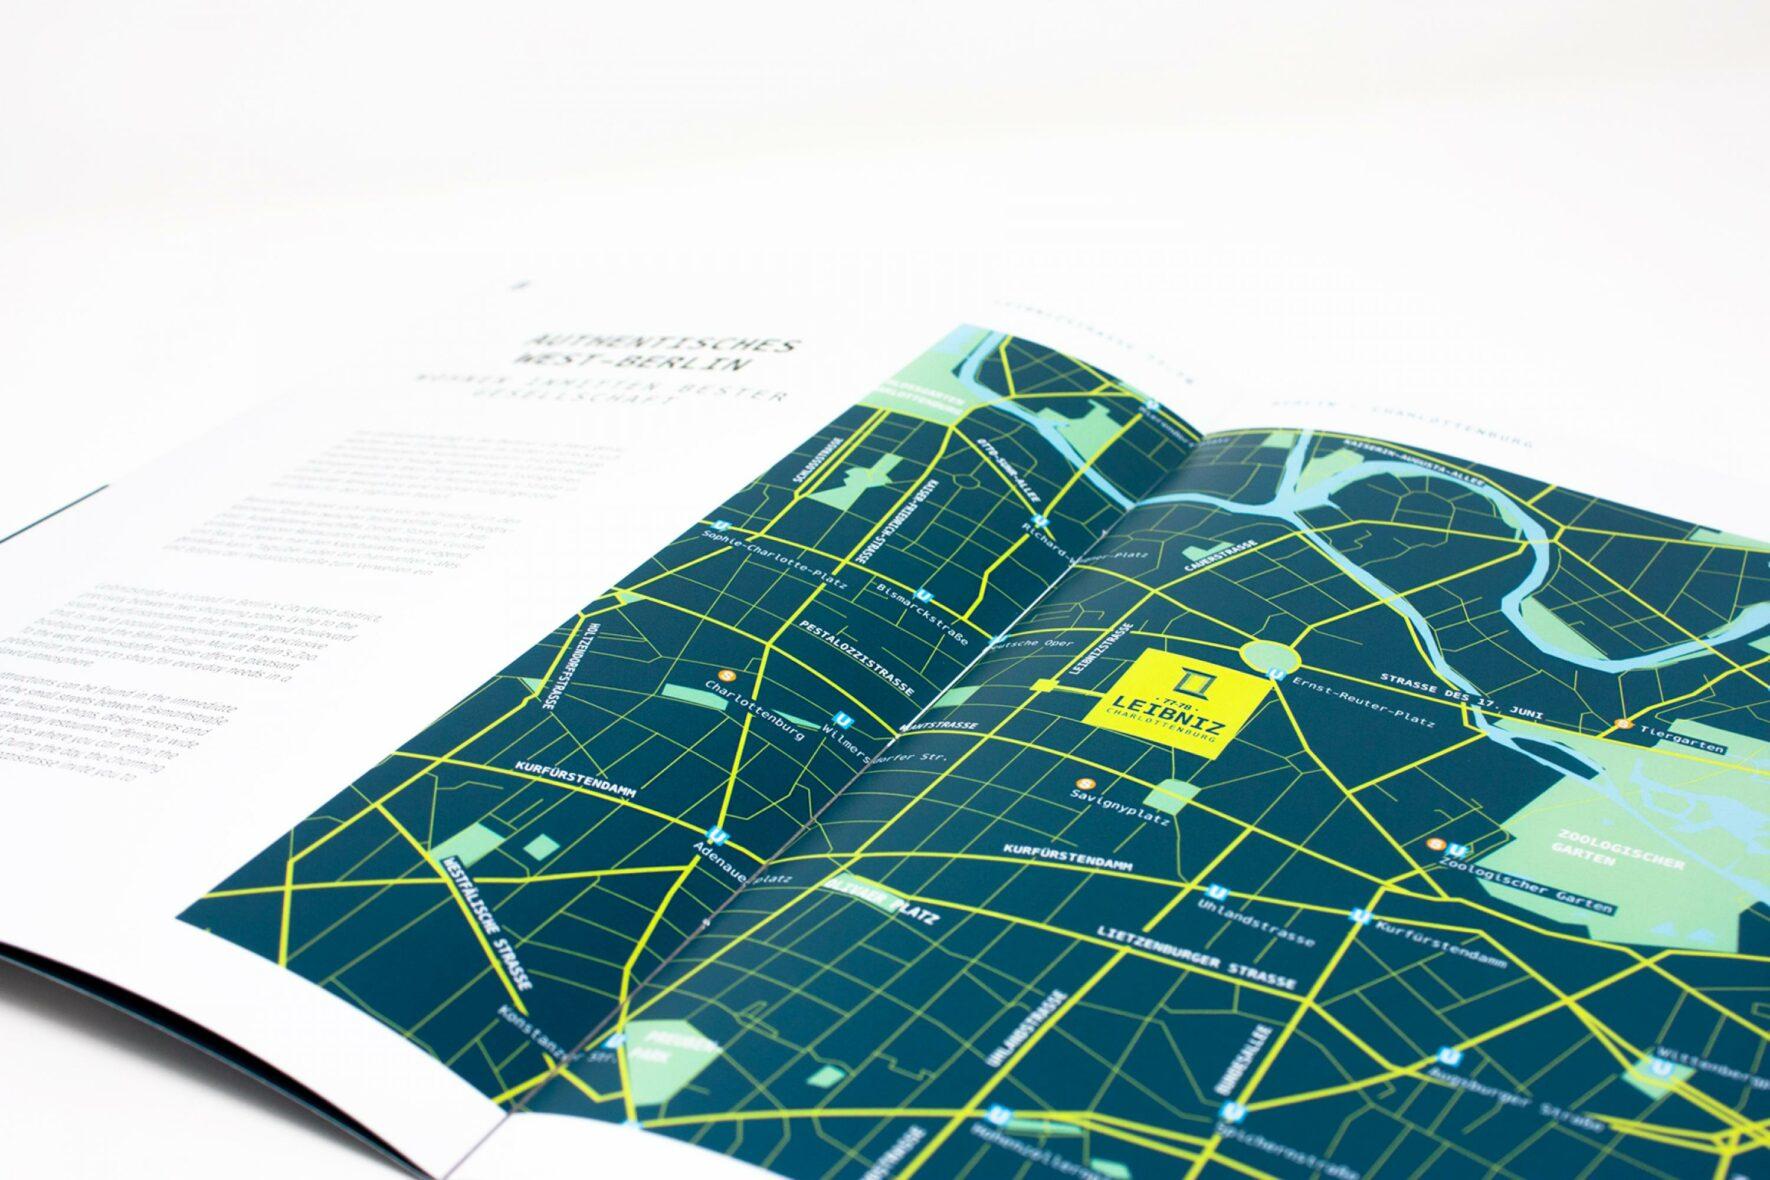 Broschuere-Leibniz-Immobilienbranding-Trendcity-FORMLOS-berlin-Print54